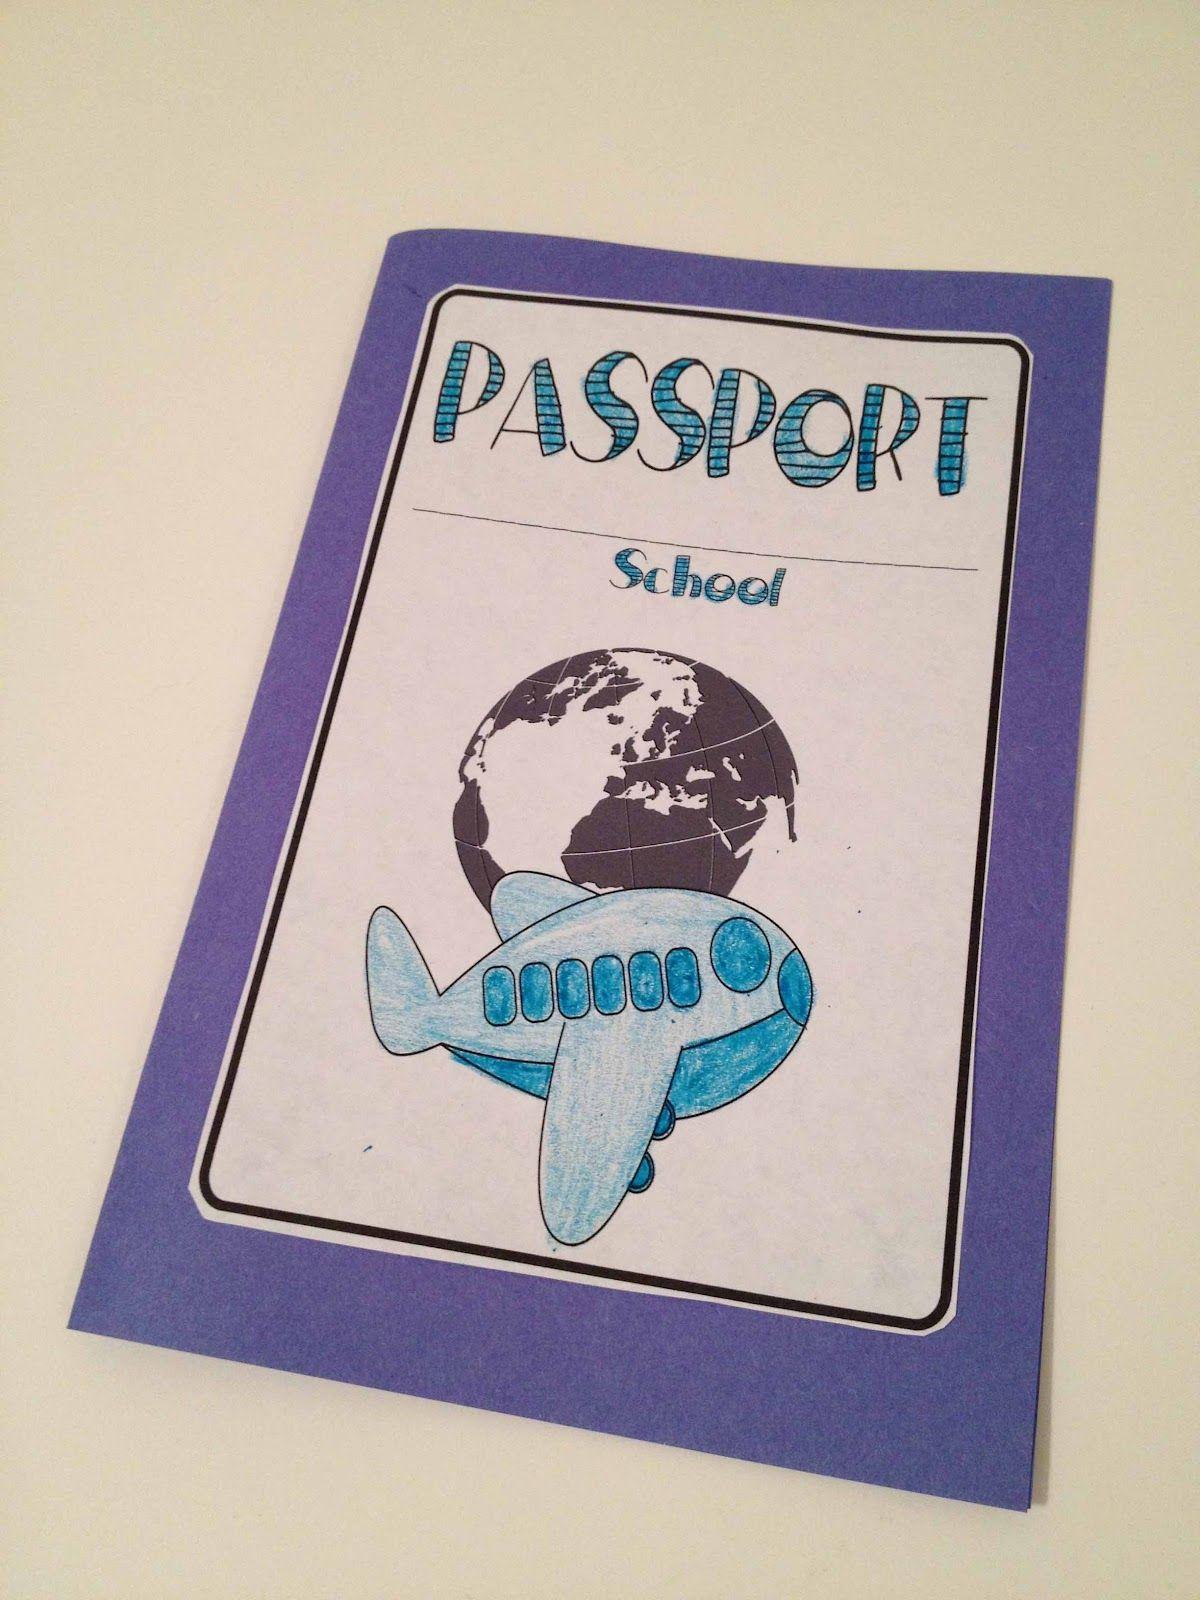 Passport to learn phone number, address, birthday etc